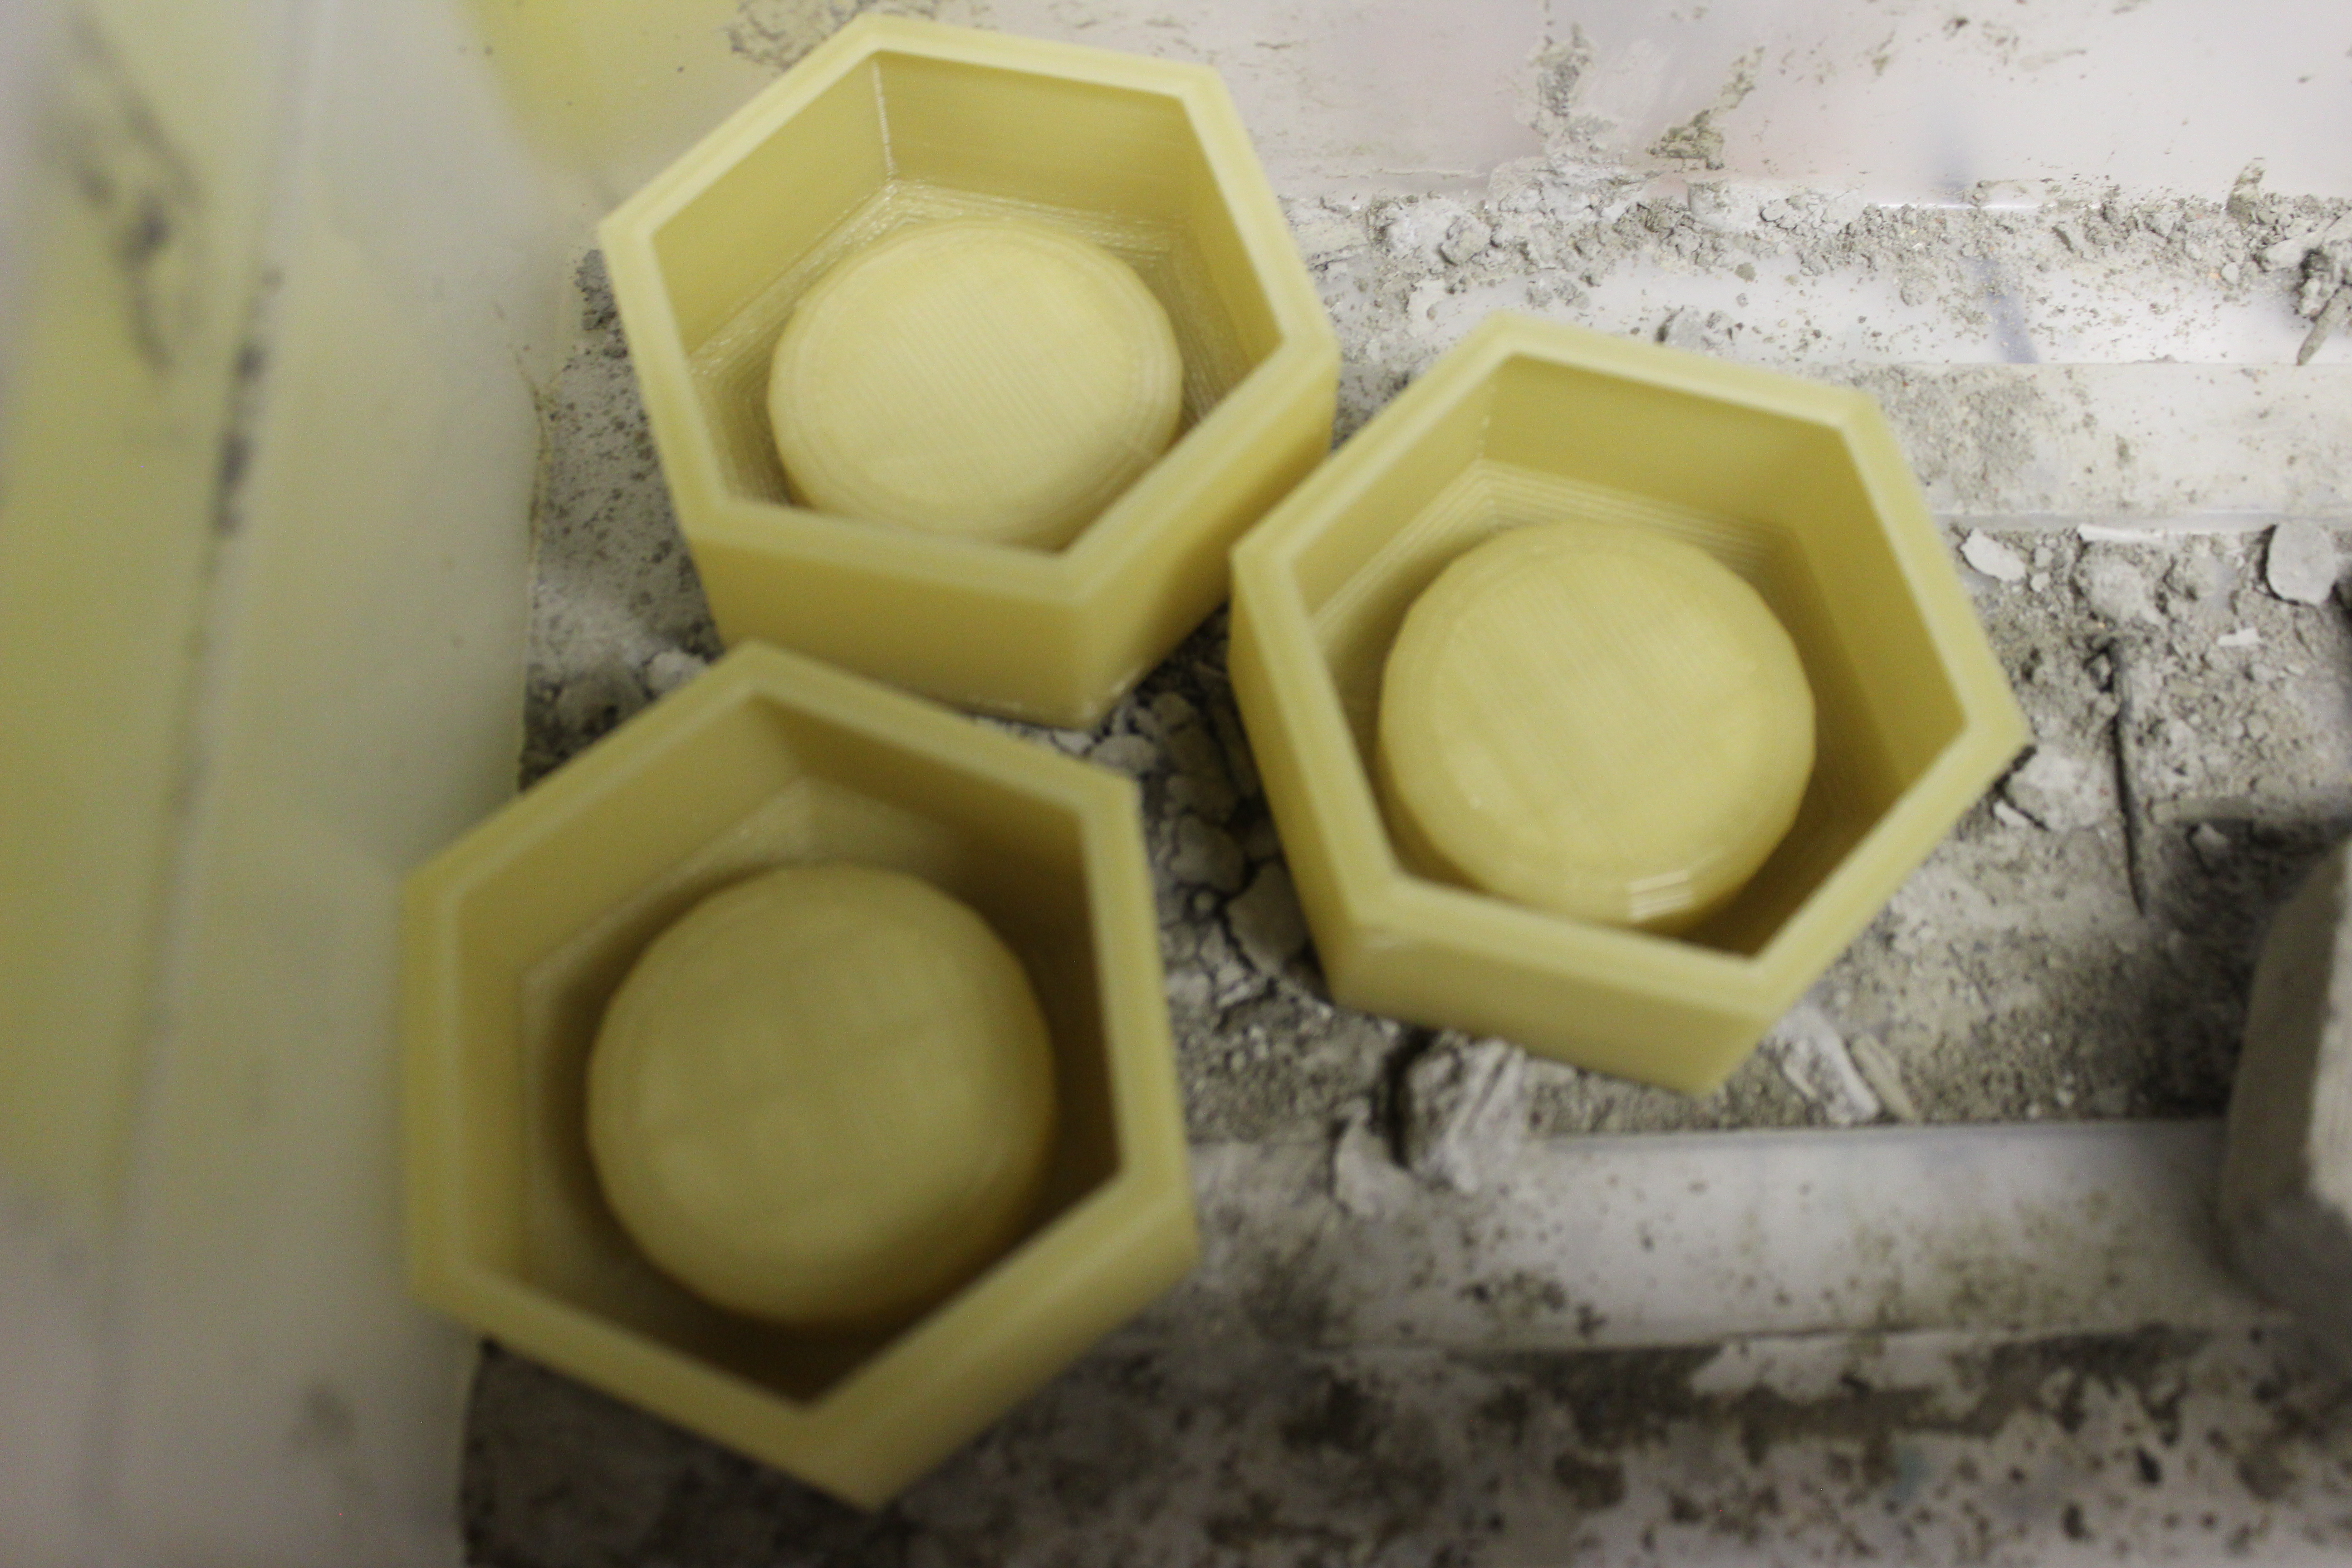 PVA molds